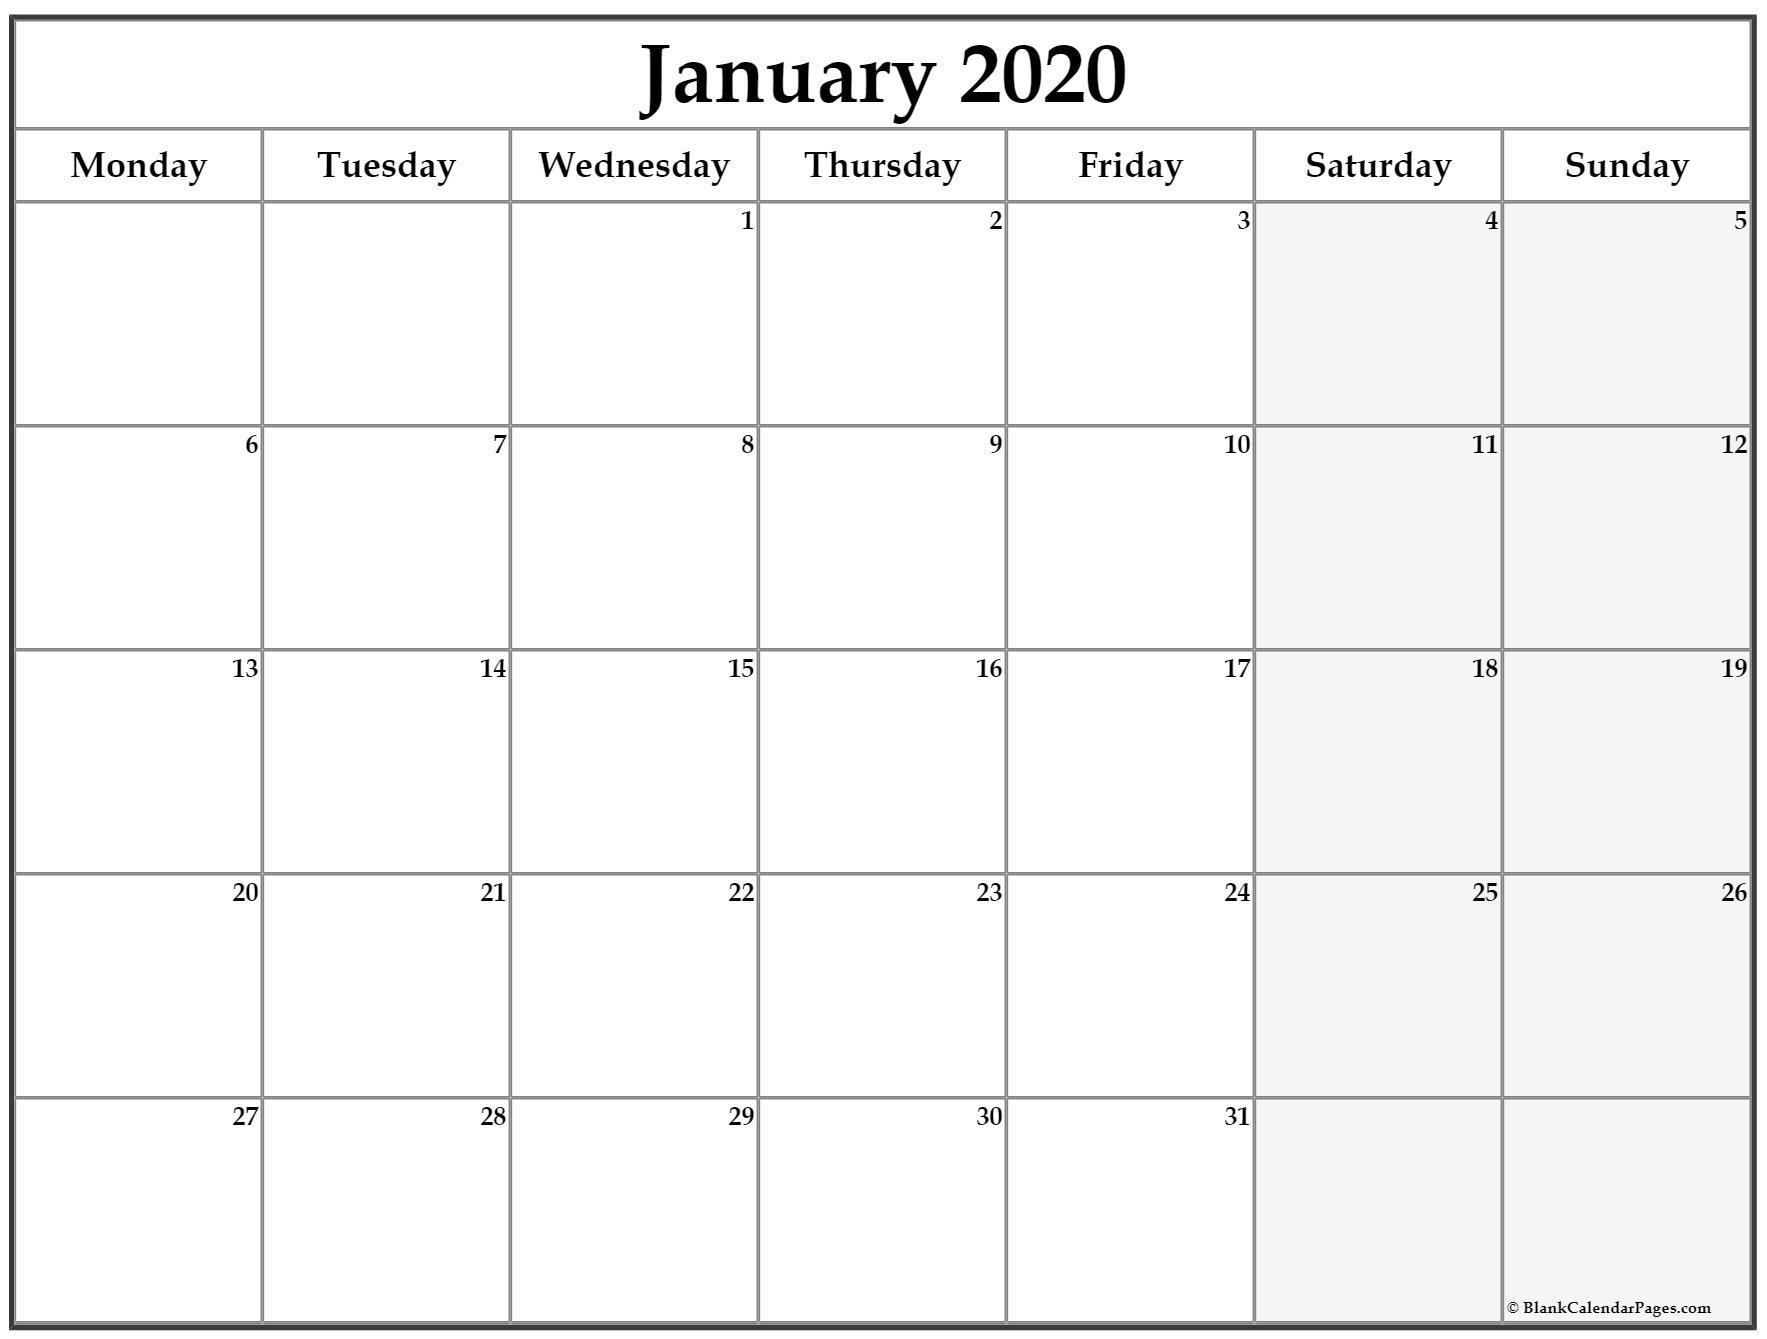 January 2020 Monday Calendar | Monday To Sunday Calender To Print With Monday Start Date